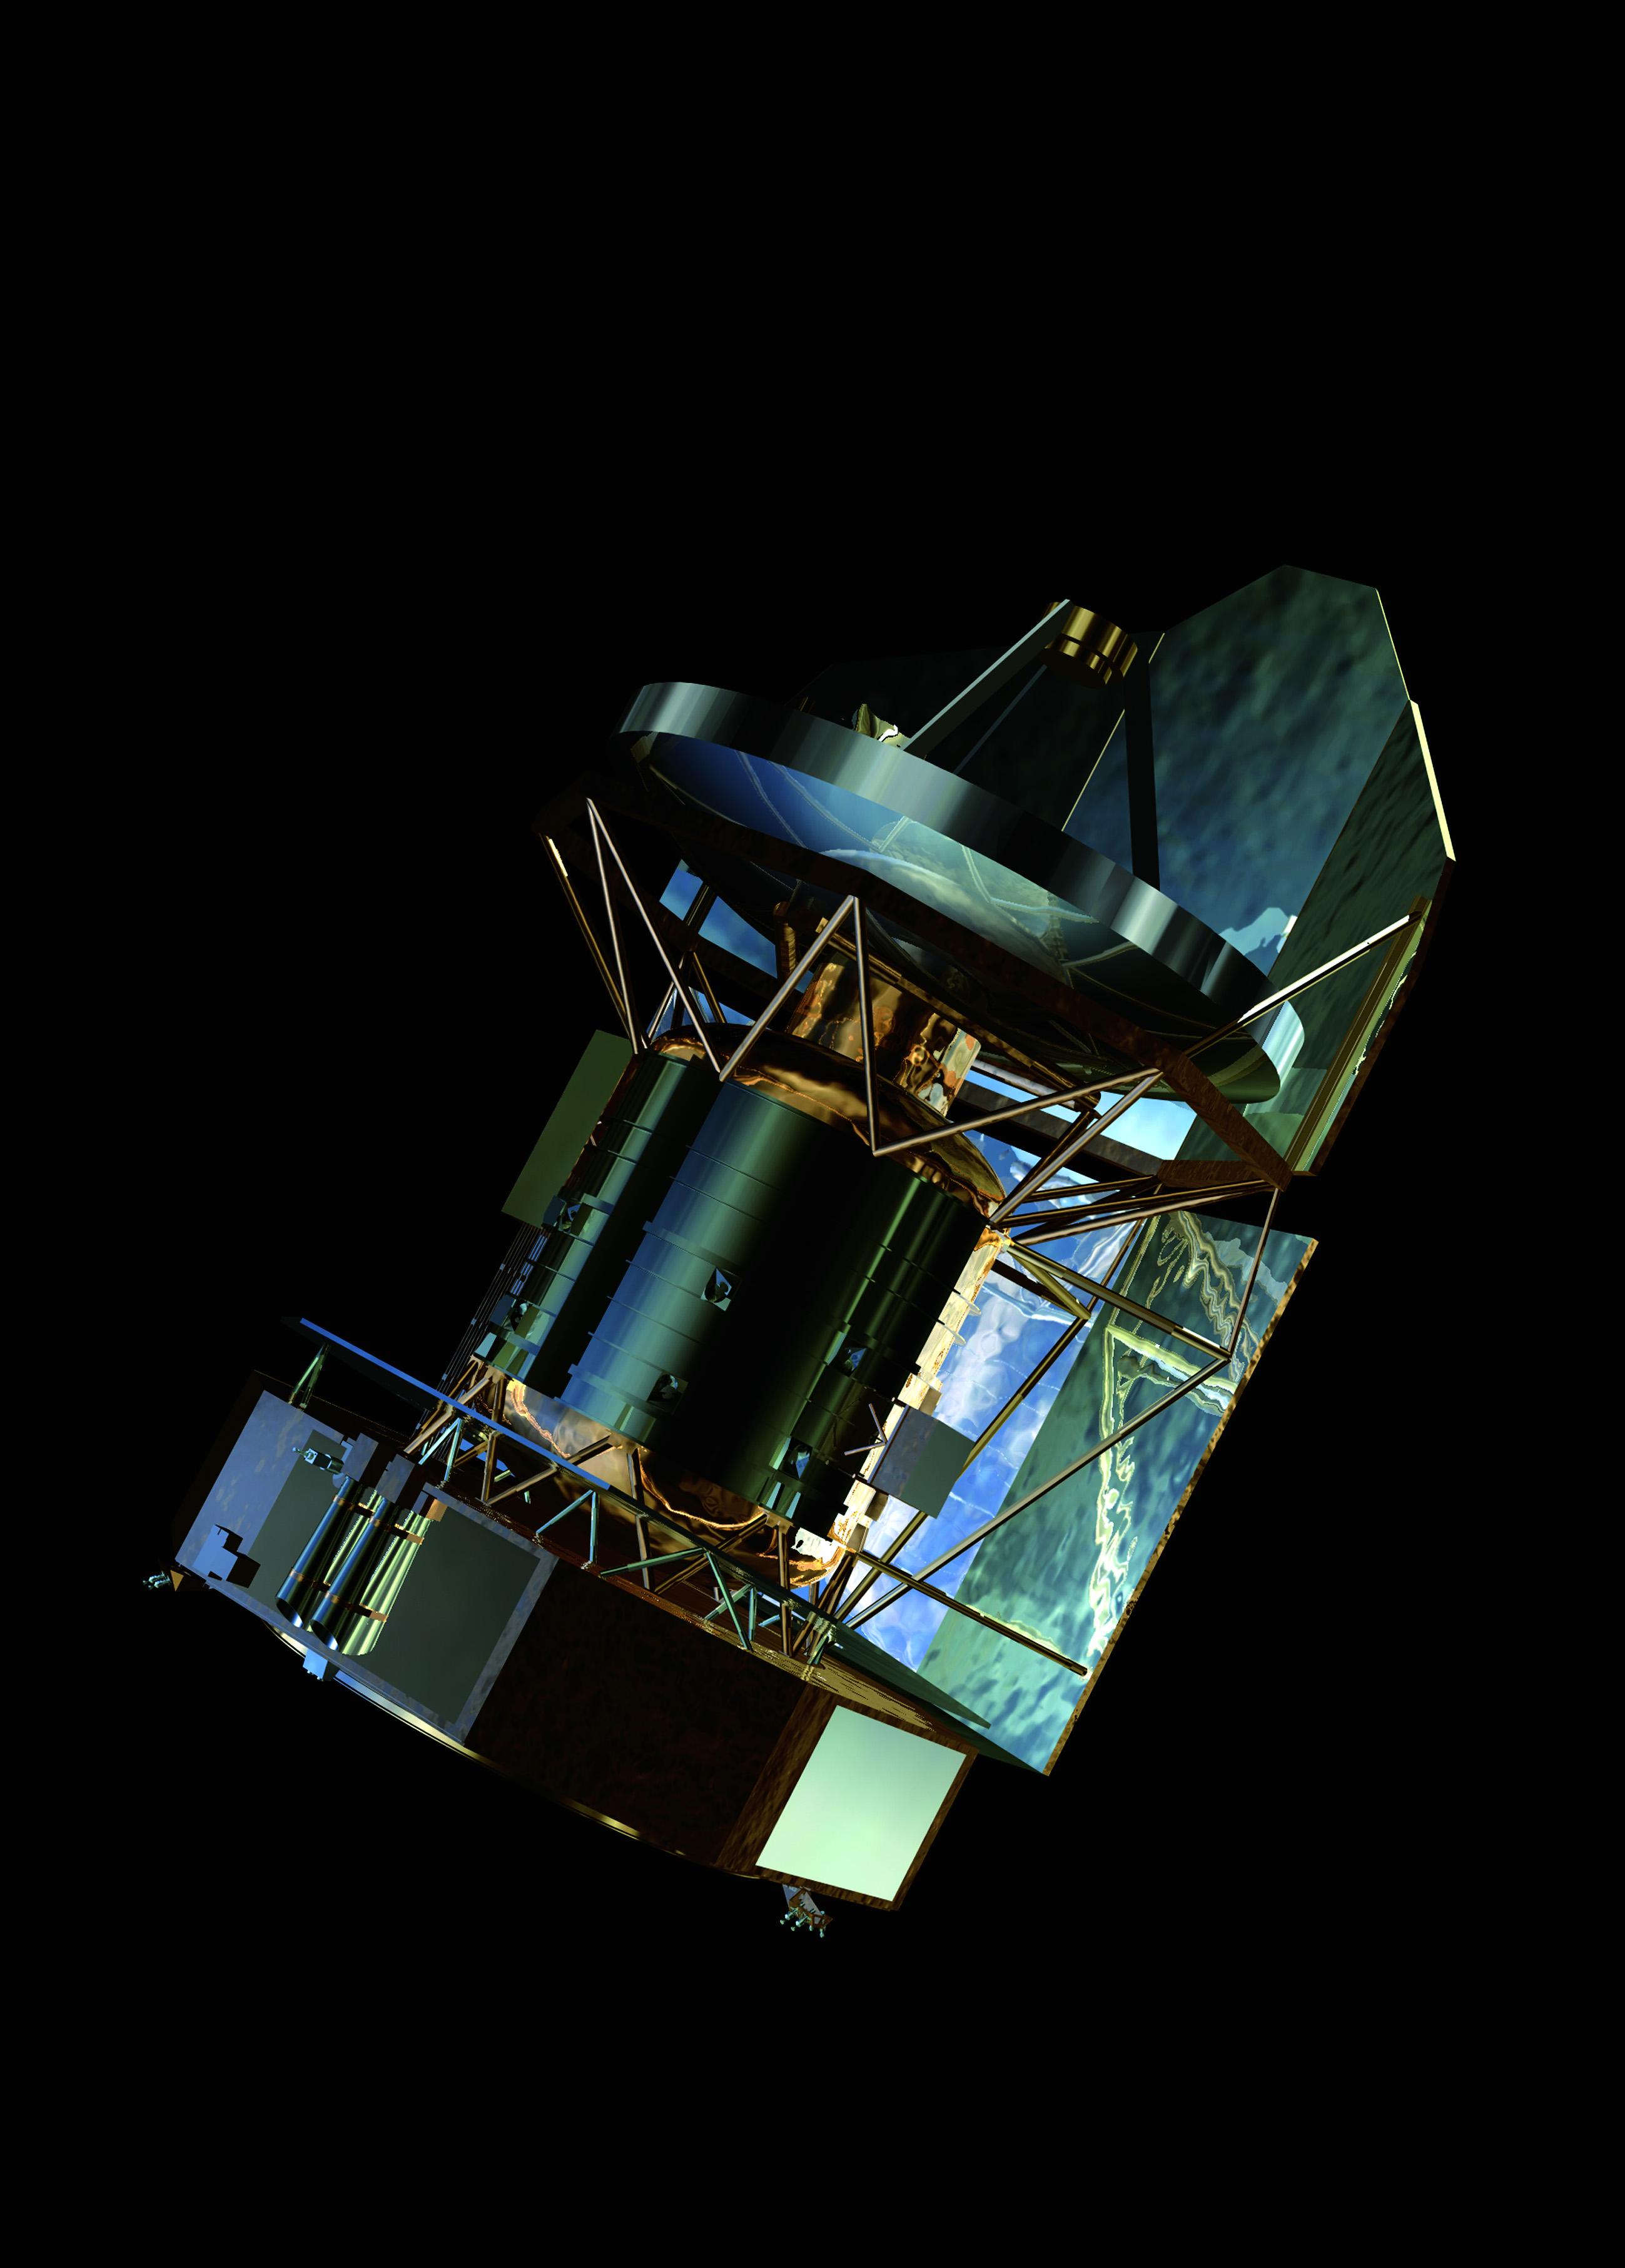 Télescope Herschel Credits: ESA 2002/Medialab